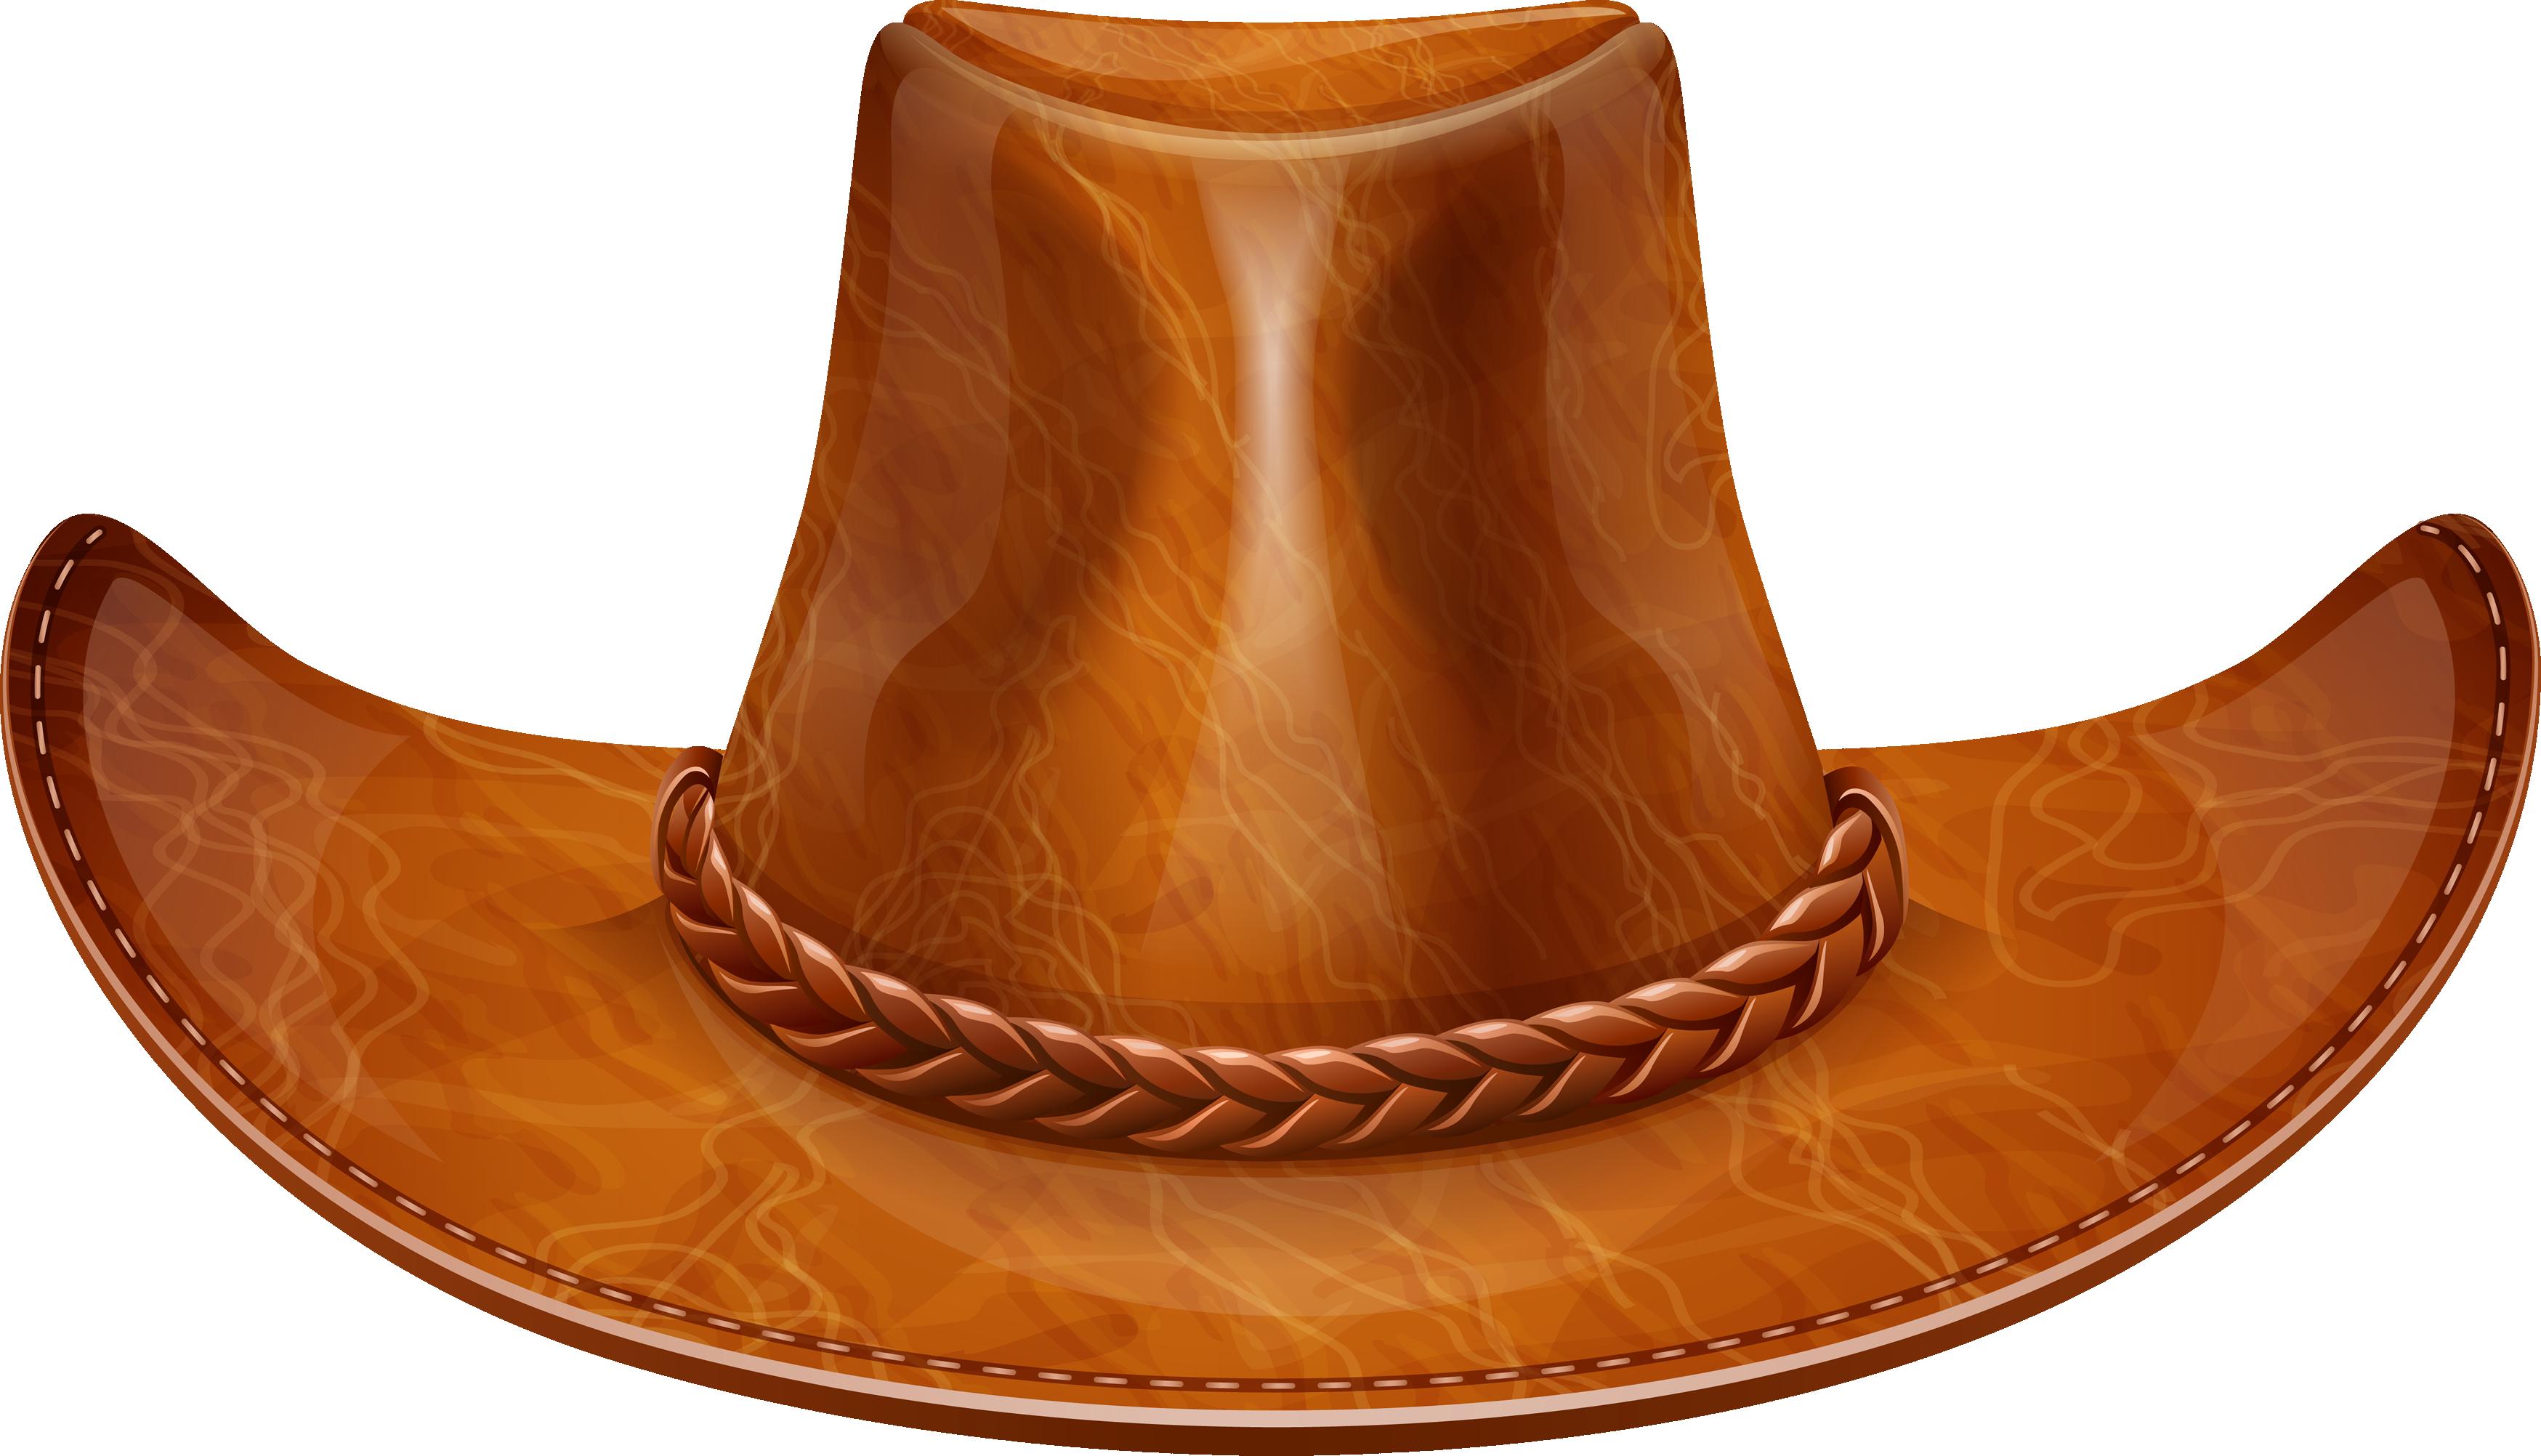 3497x2004 Hat Png Image